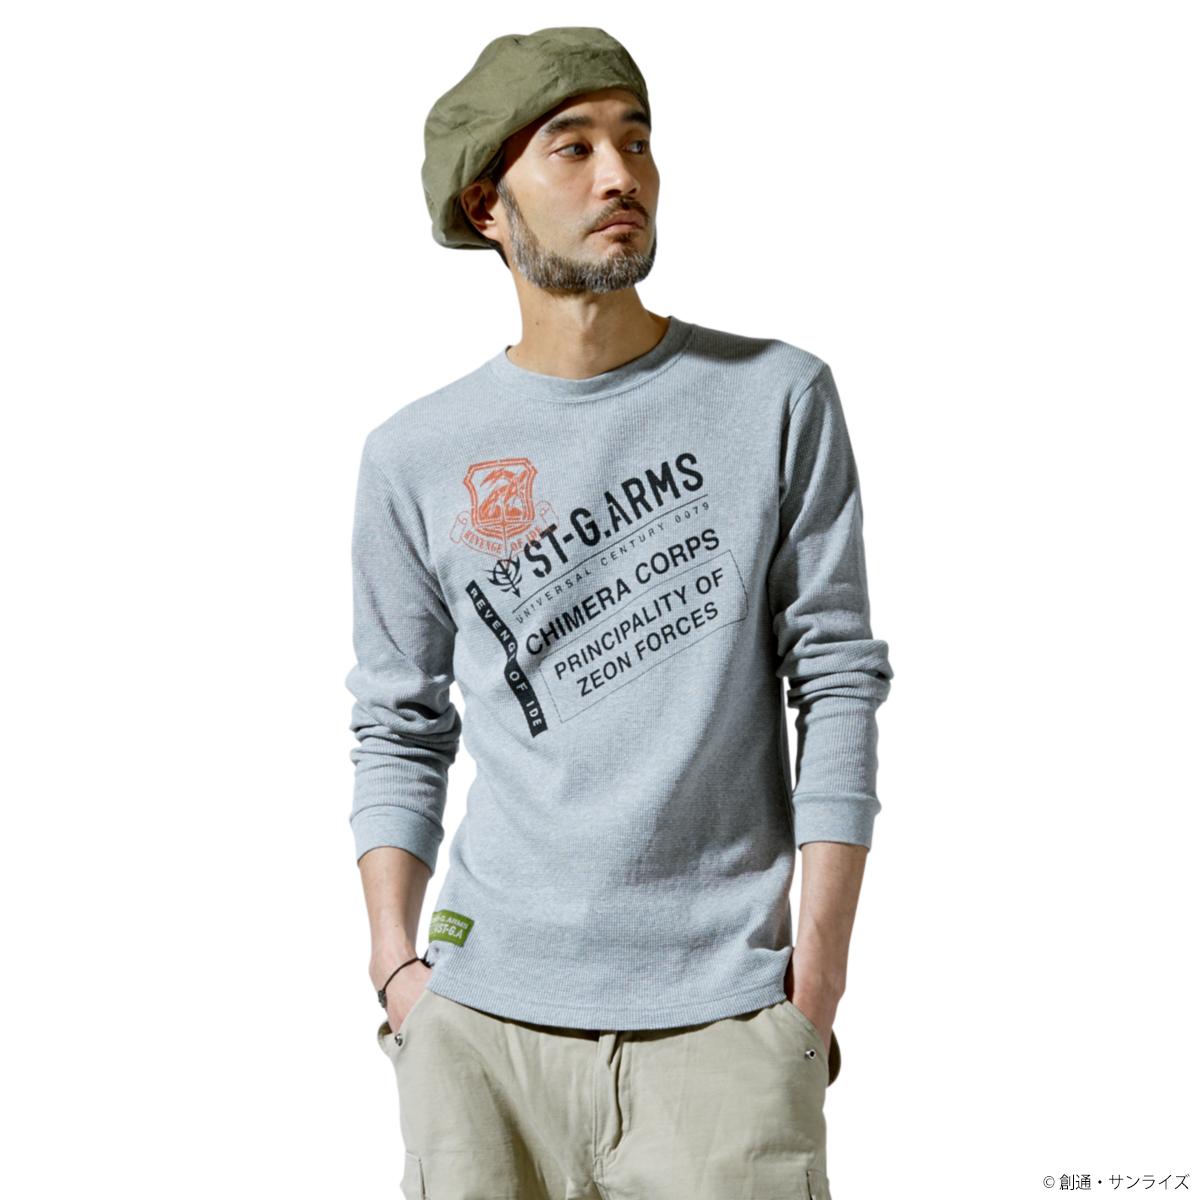 STRICT-G.ARMS『機動戦士ガンダム』ワッフル長袖Tシャツ CHIMERA CORPS